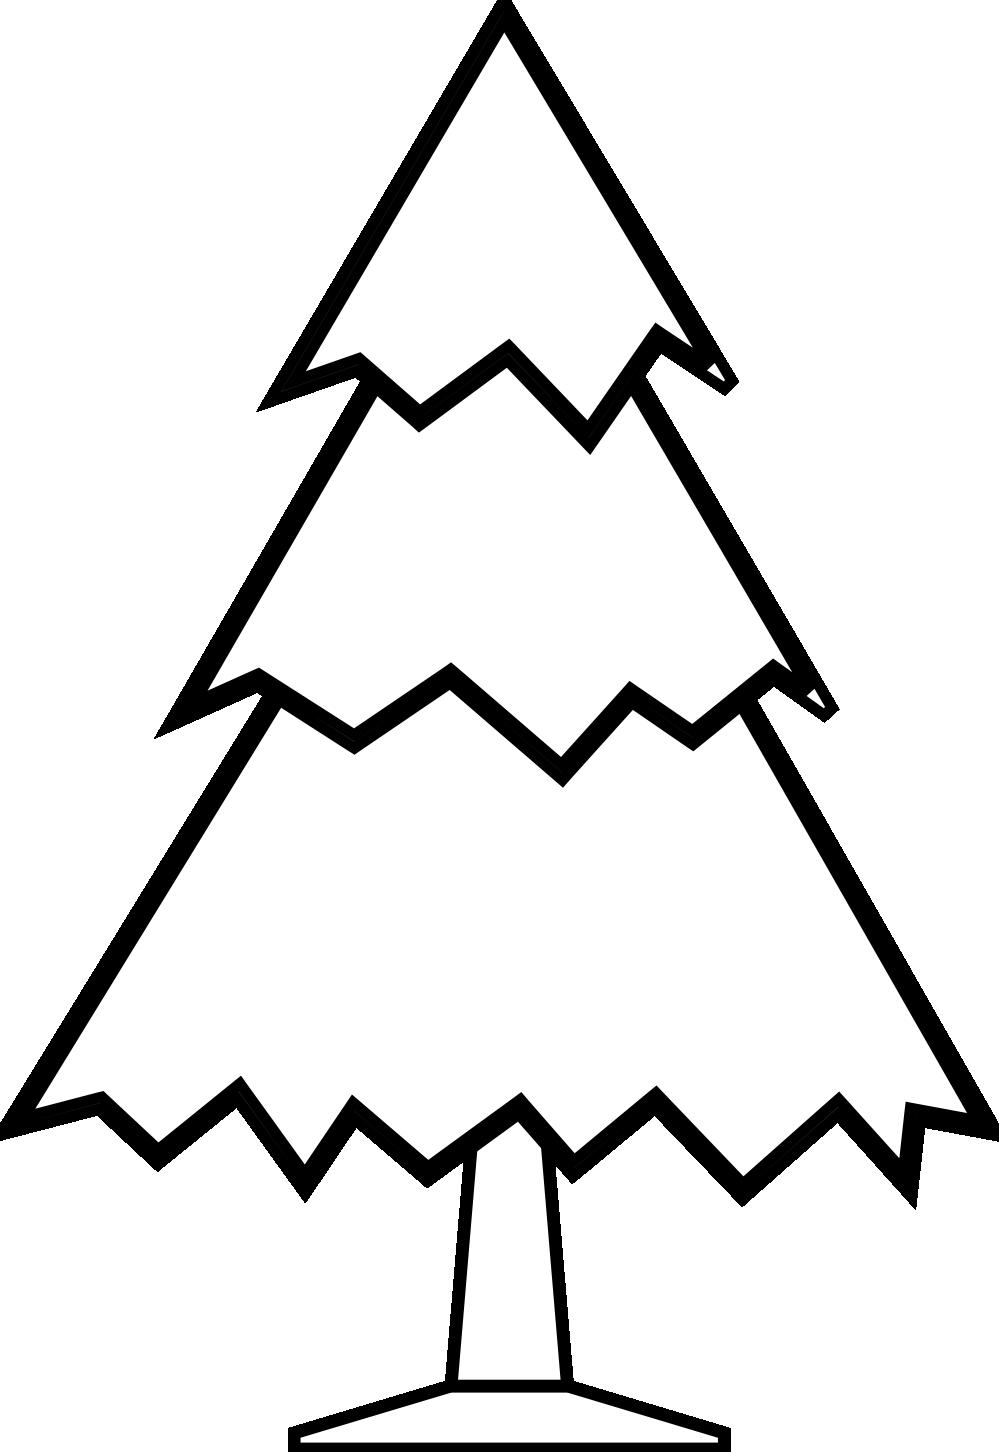 clip art xmas christmas tree clipart panda free clipart images rh clipartpanda com christmas tree clipart black and white outline Christmas Tree Silhouette